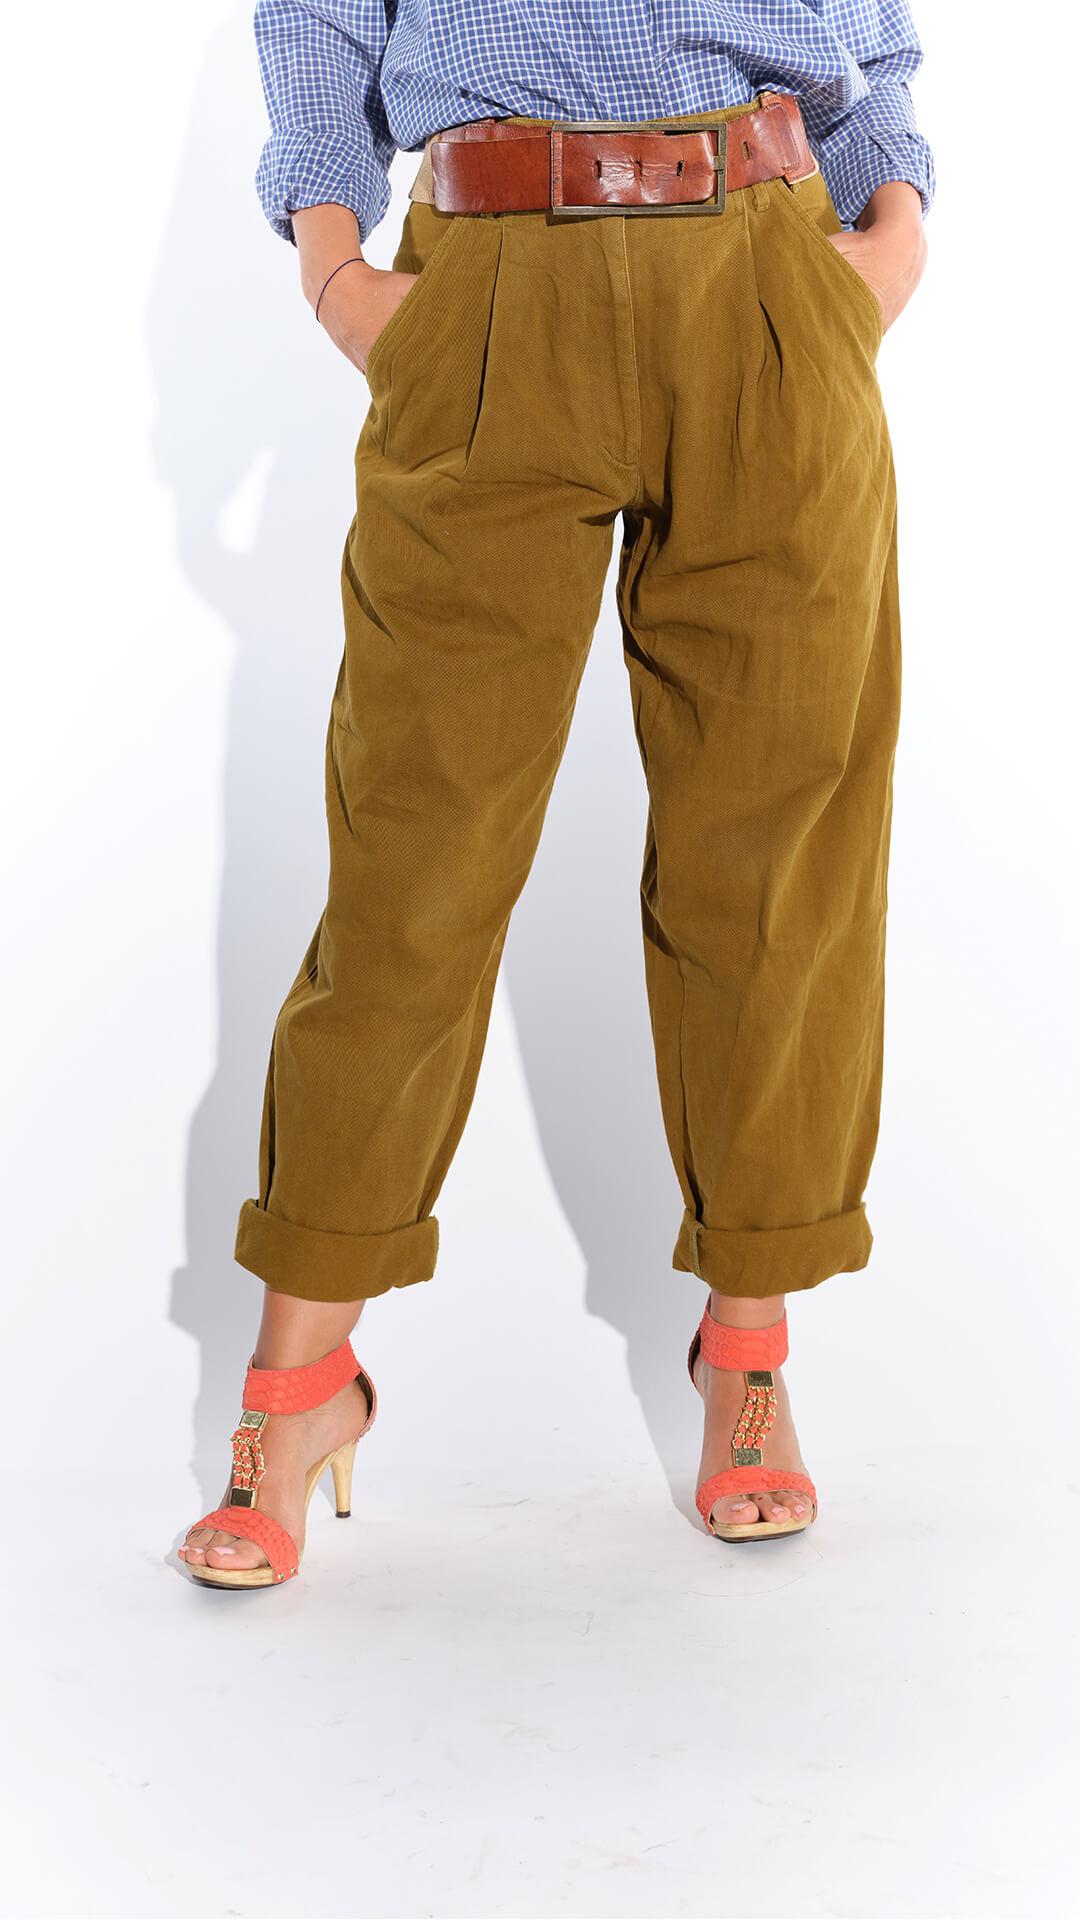 Retro pantolon, pantolon modası, 90lar hardal rengi bol kesim yandan cepli pamuklu pantolon